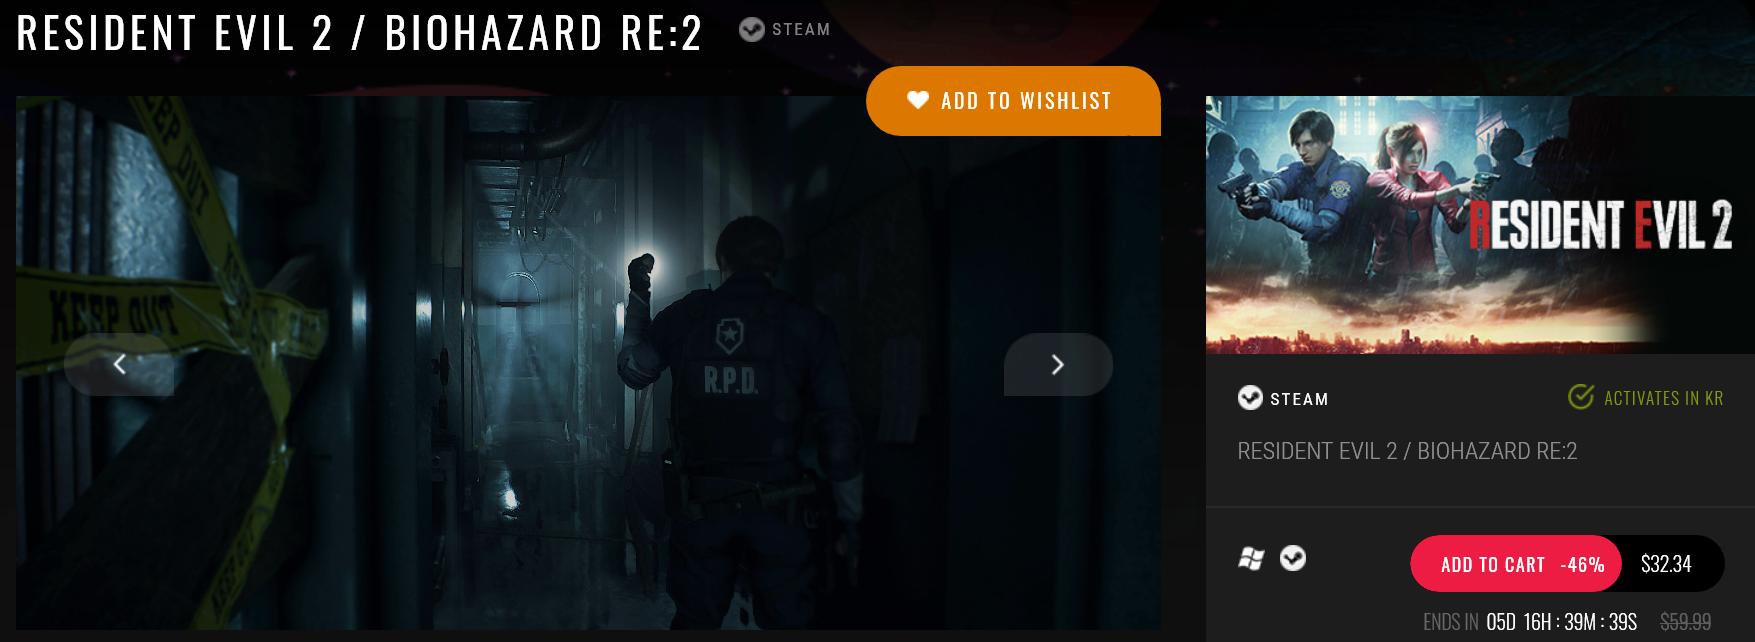 Screenshot_2019-06-05 RESIDENT EVIL 2 BIOHAZARD RE 2.png